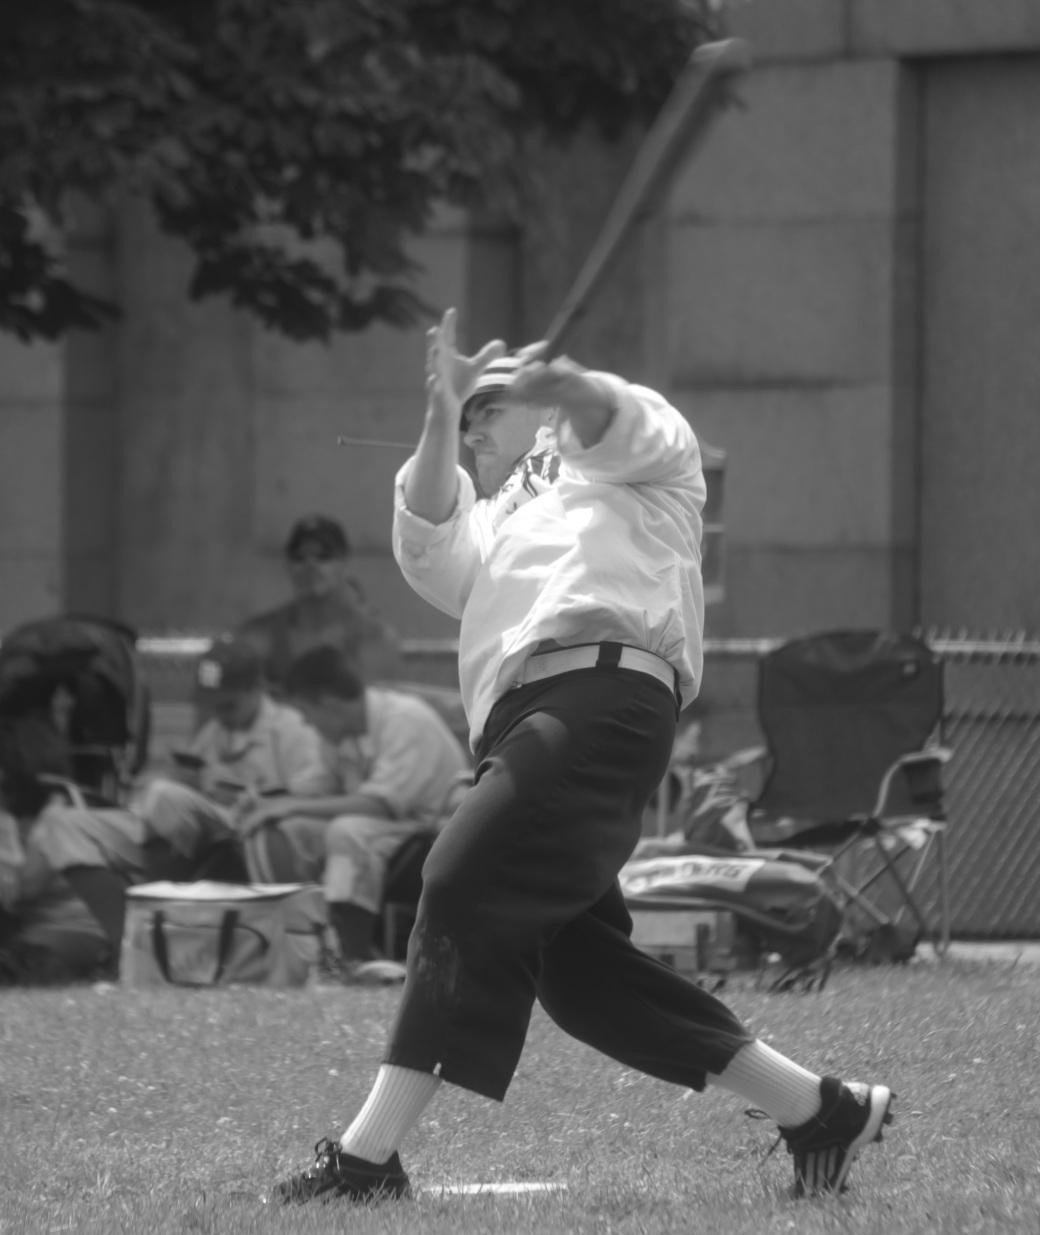 boston georges island Melrose Pondfielders Bristol Blues New Hampshire Granites game june 30 14